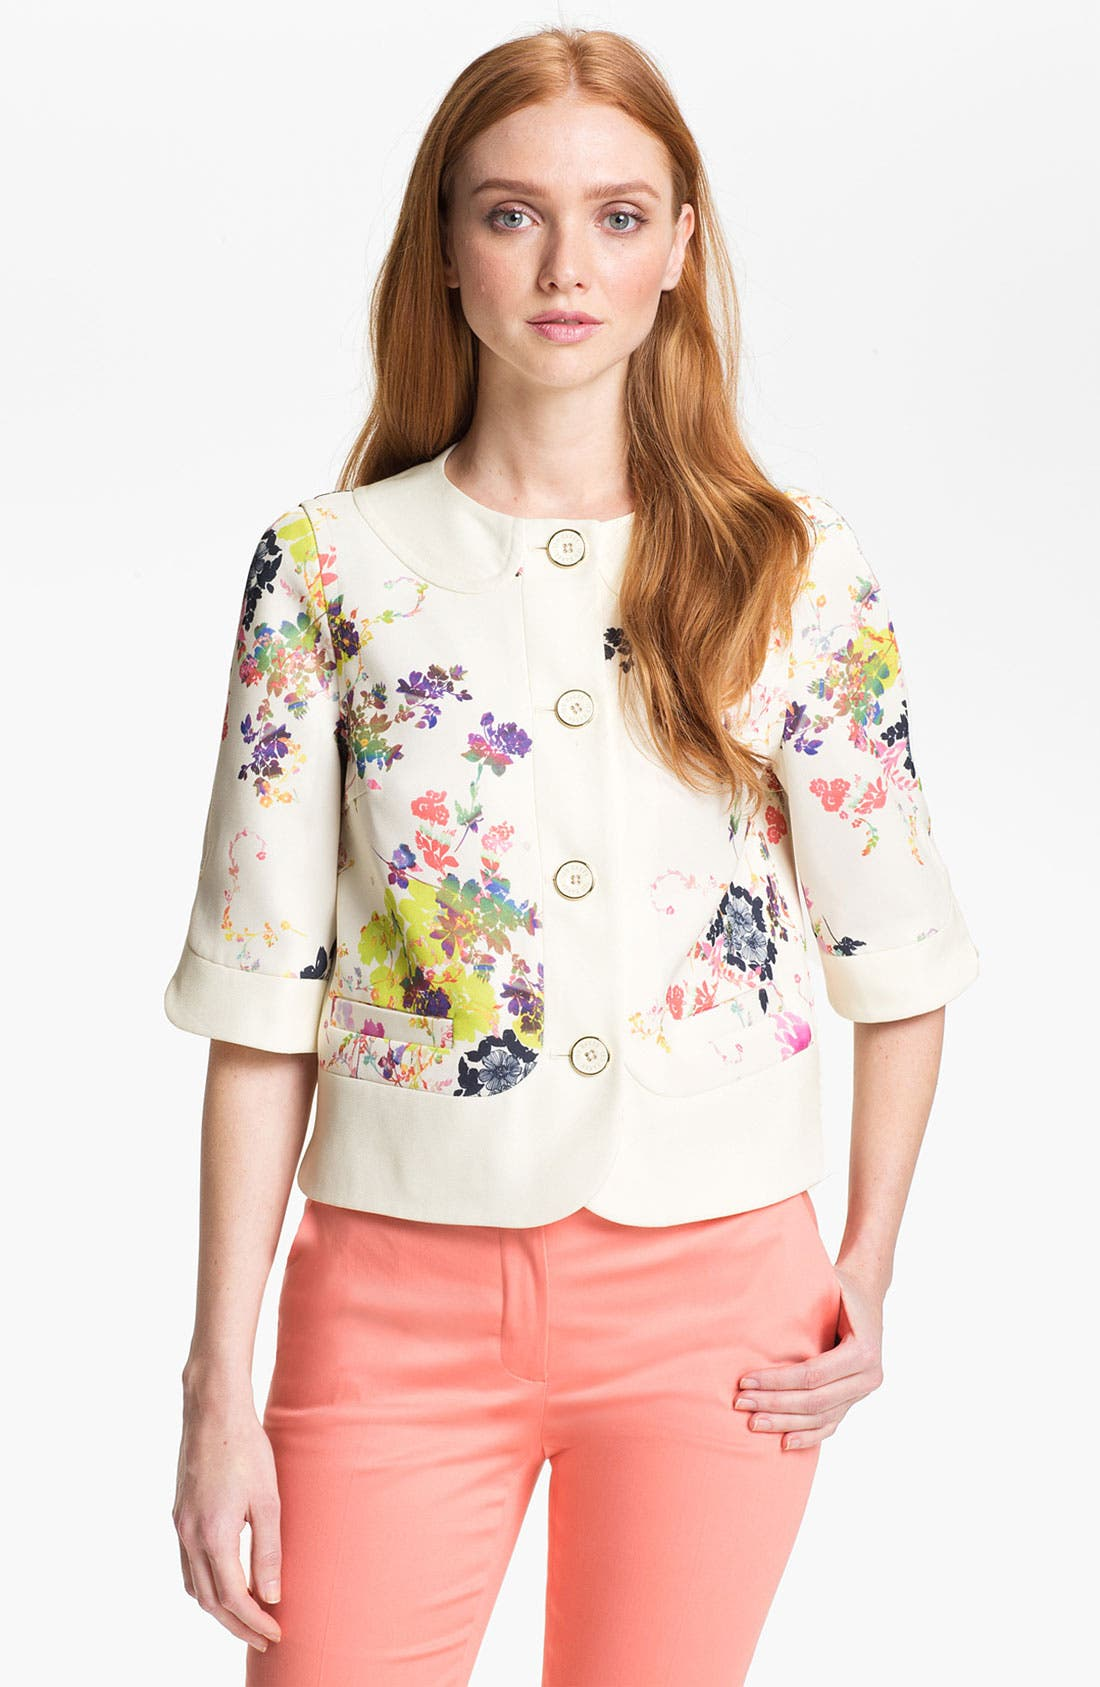 Alternate Image 1 Selected - Ted Baker London 'Summer Bloom' Print Jacket